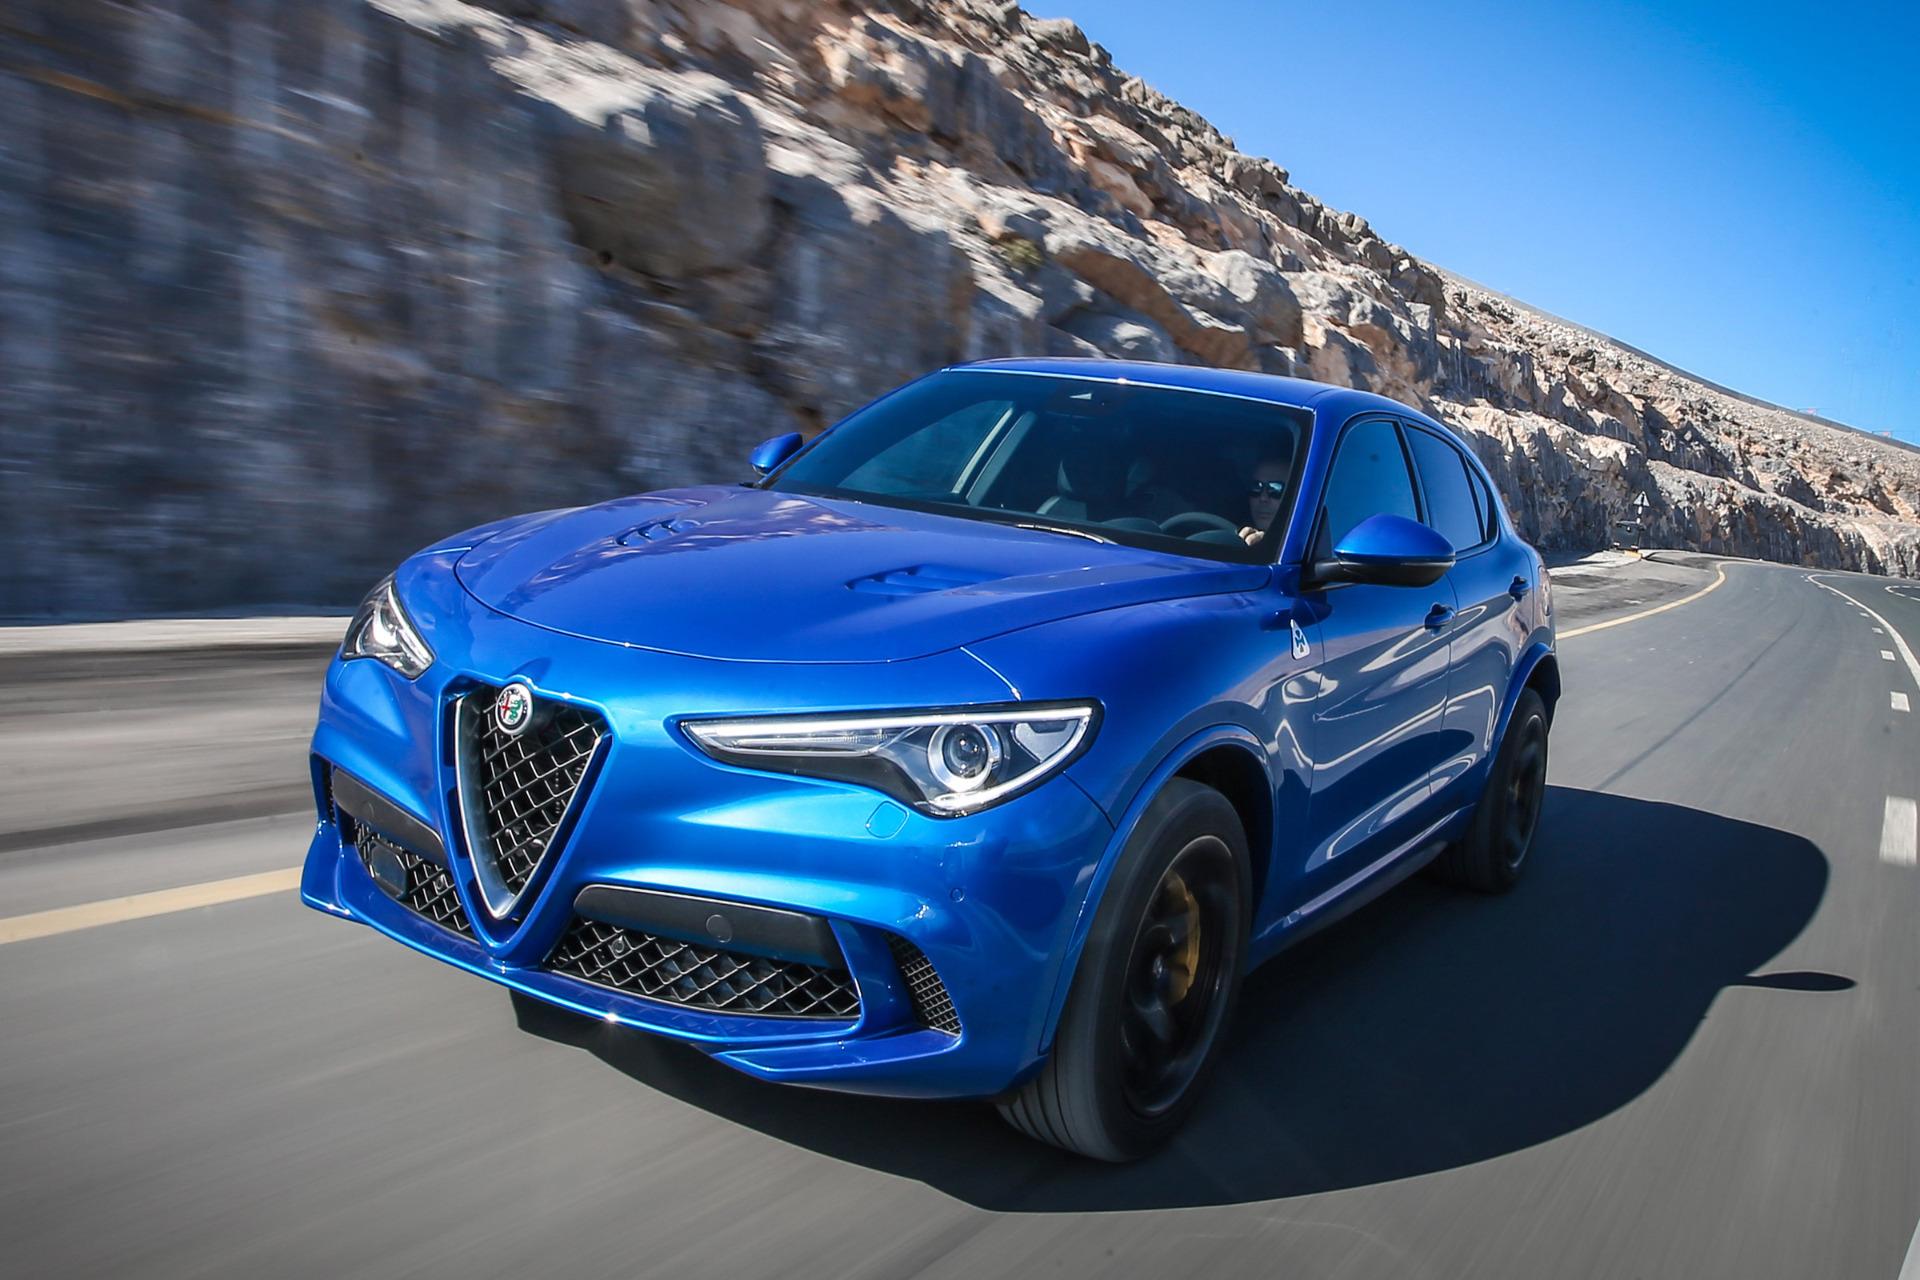 2018 Alfa Romeo Stelvio Quadrifoglio Currently Taking Orders Stock